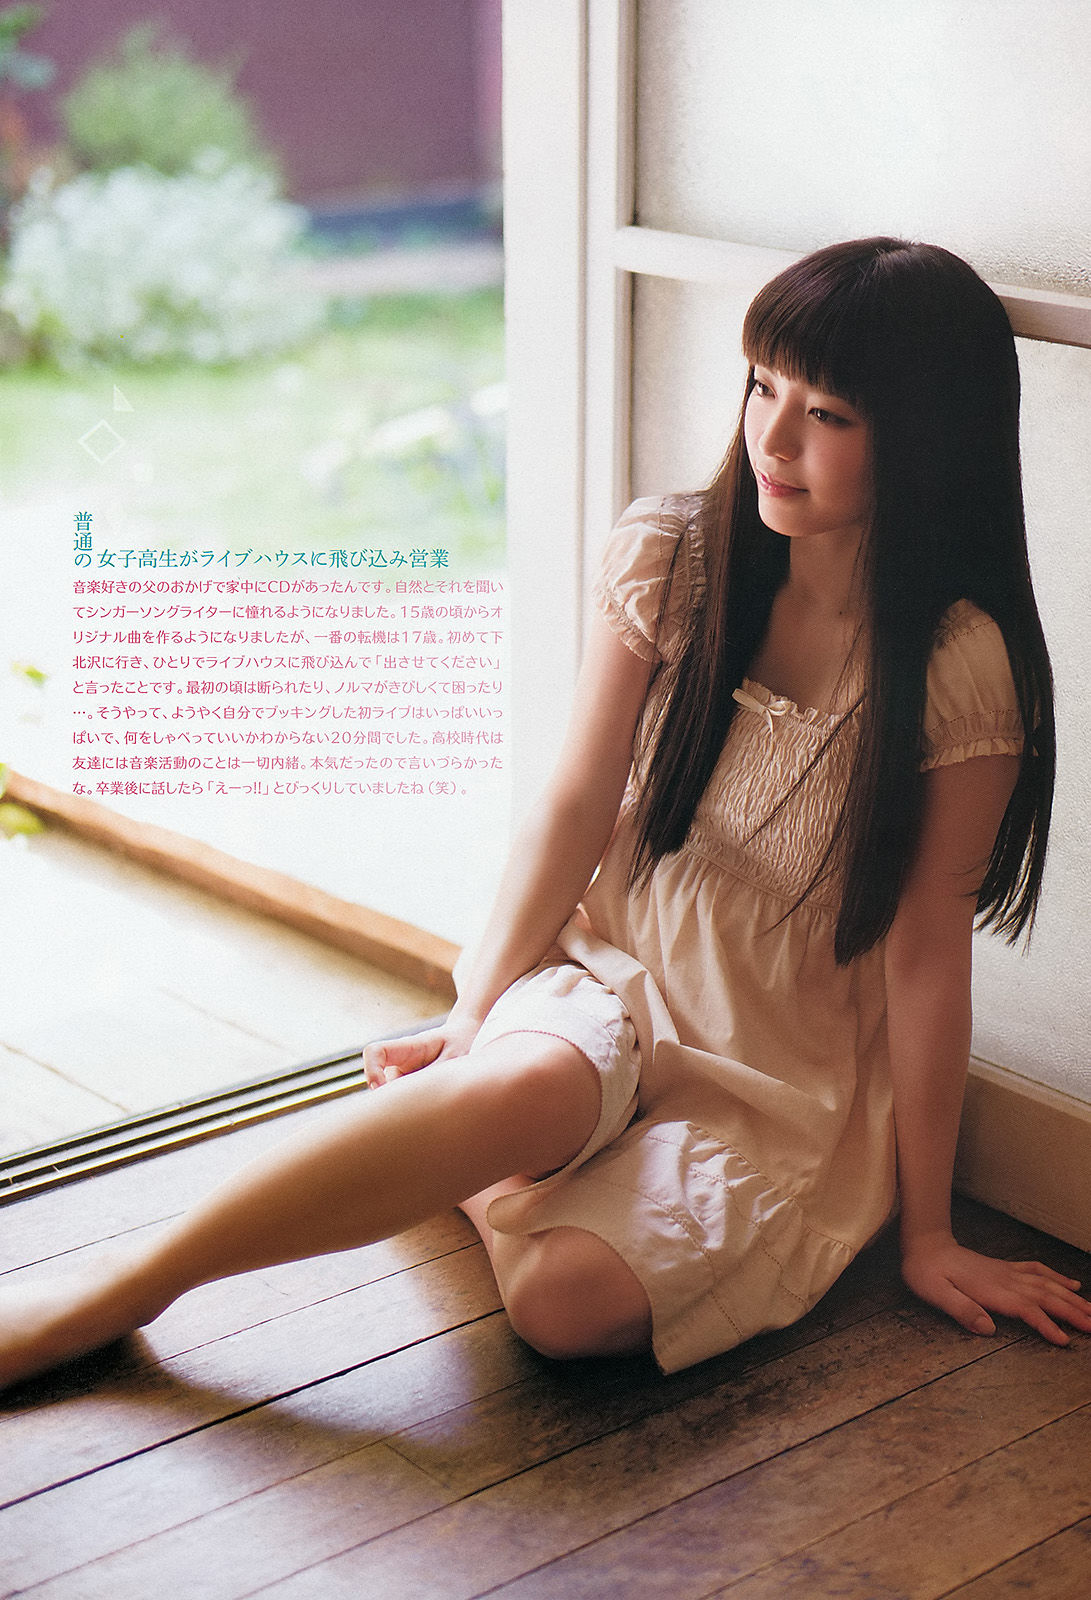 [Weekly Big Comic Spirits杂志写真]Miwa超高清写真大图片(6P)|394热度